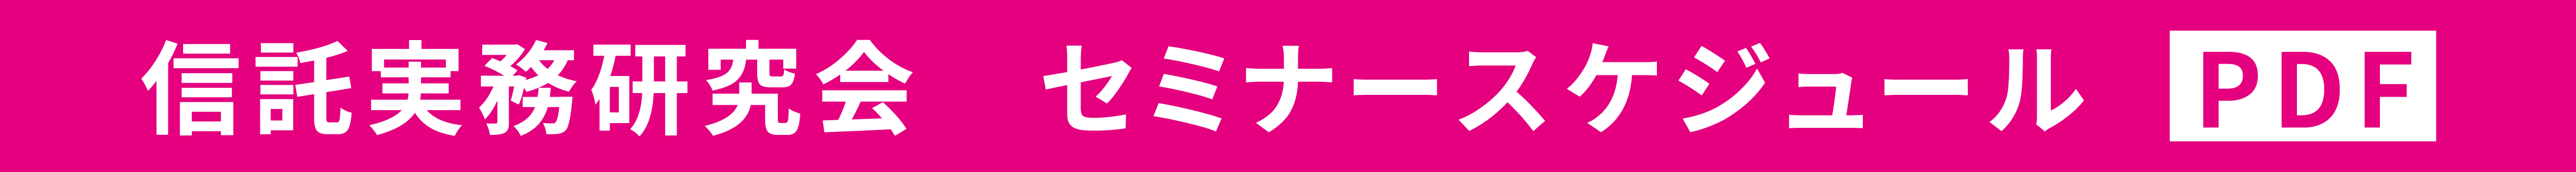 【Farbe信託実務研究会】セミナースケジュール